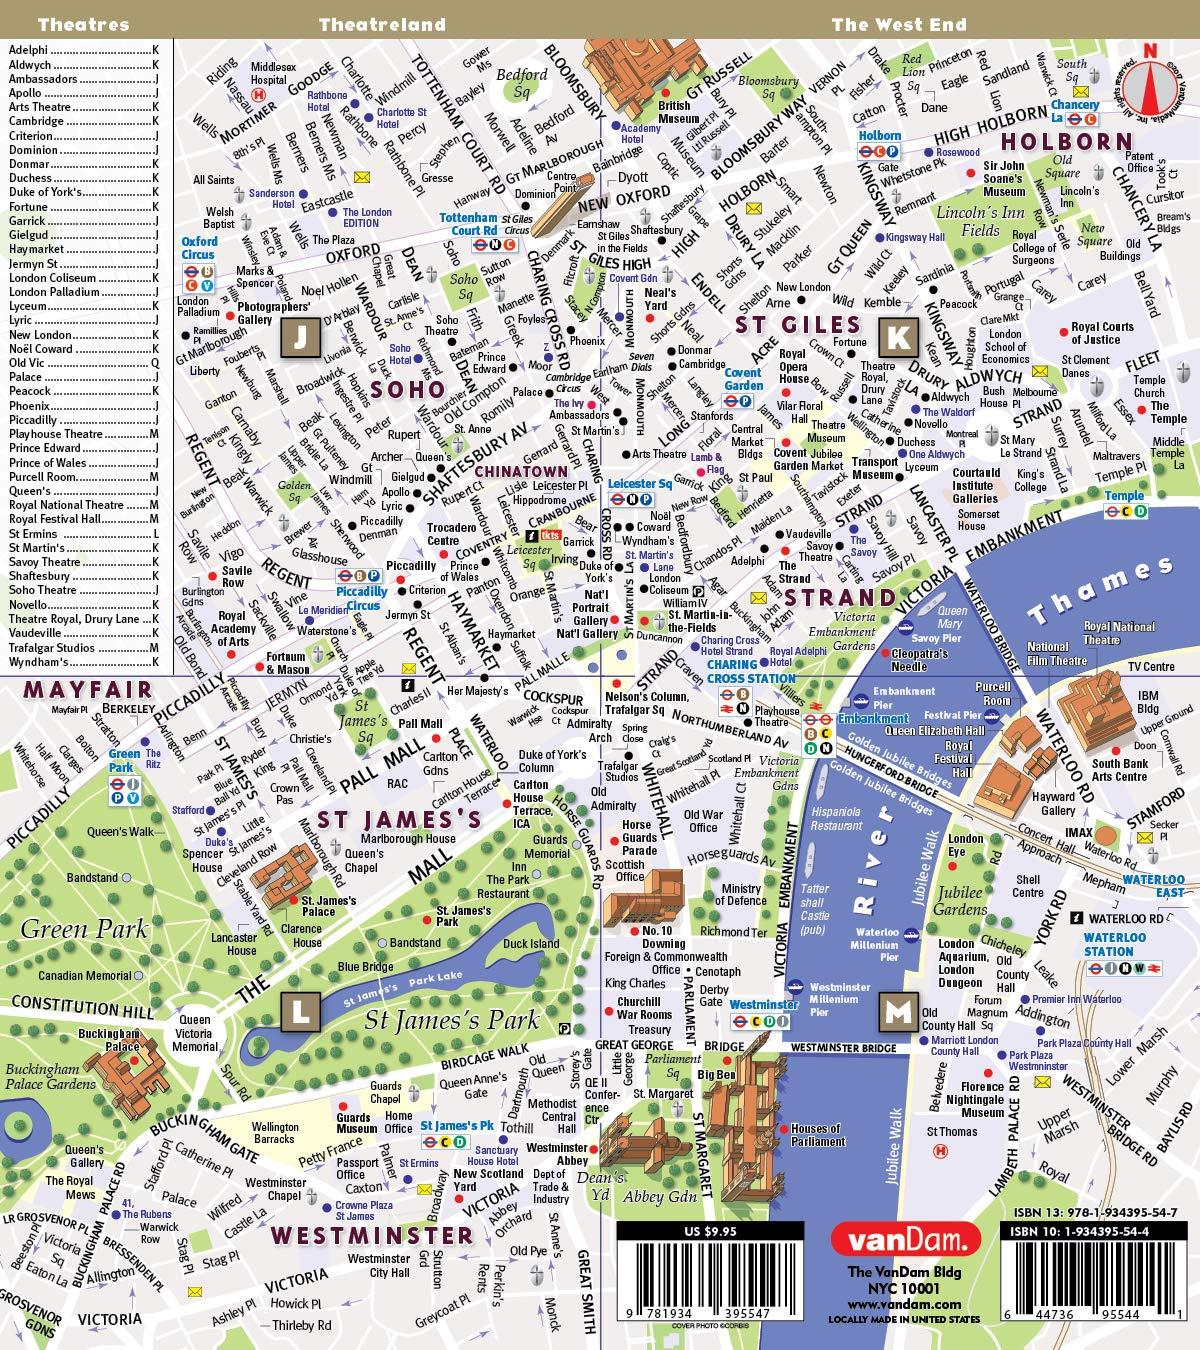 Streetsmart Paris Map By Vandam City Street Map Of Paris France